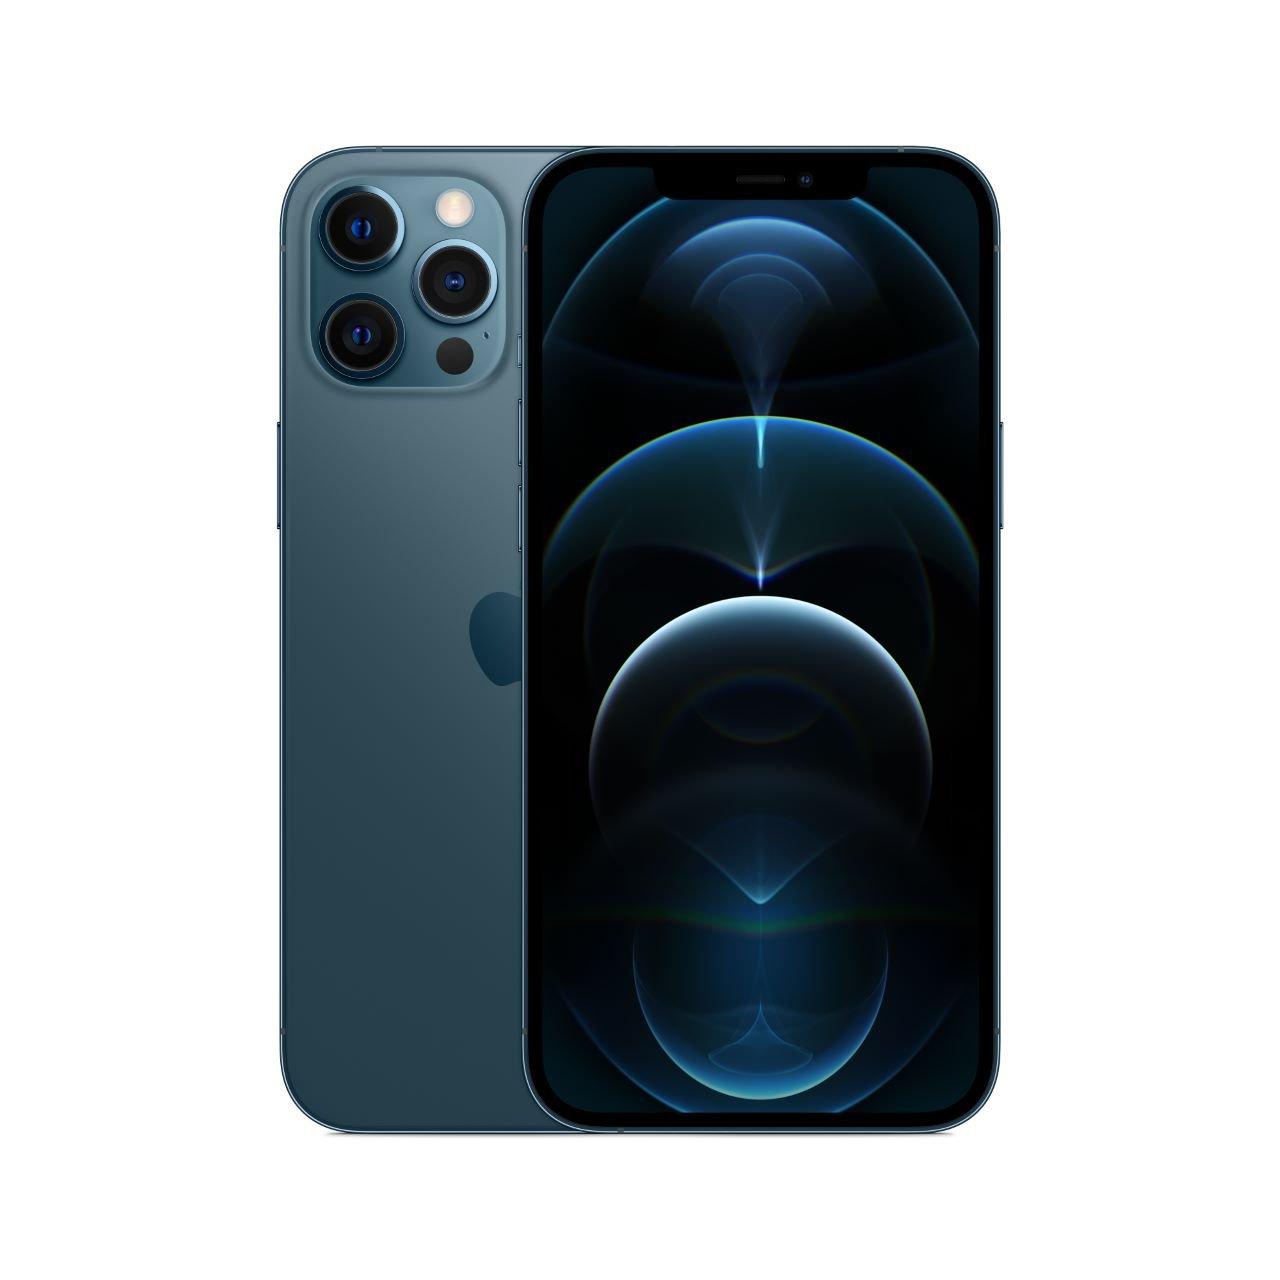 Apple iPhone 12 Pro Max Pazifikblau 256 GB MGDF3ZD/A